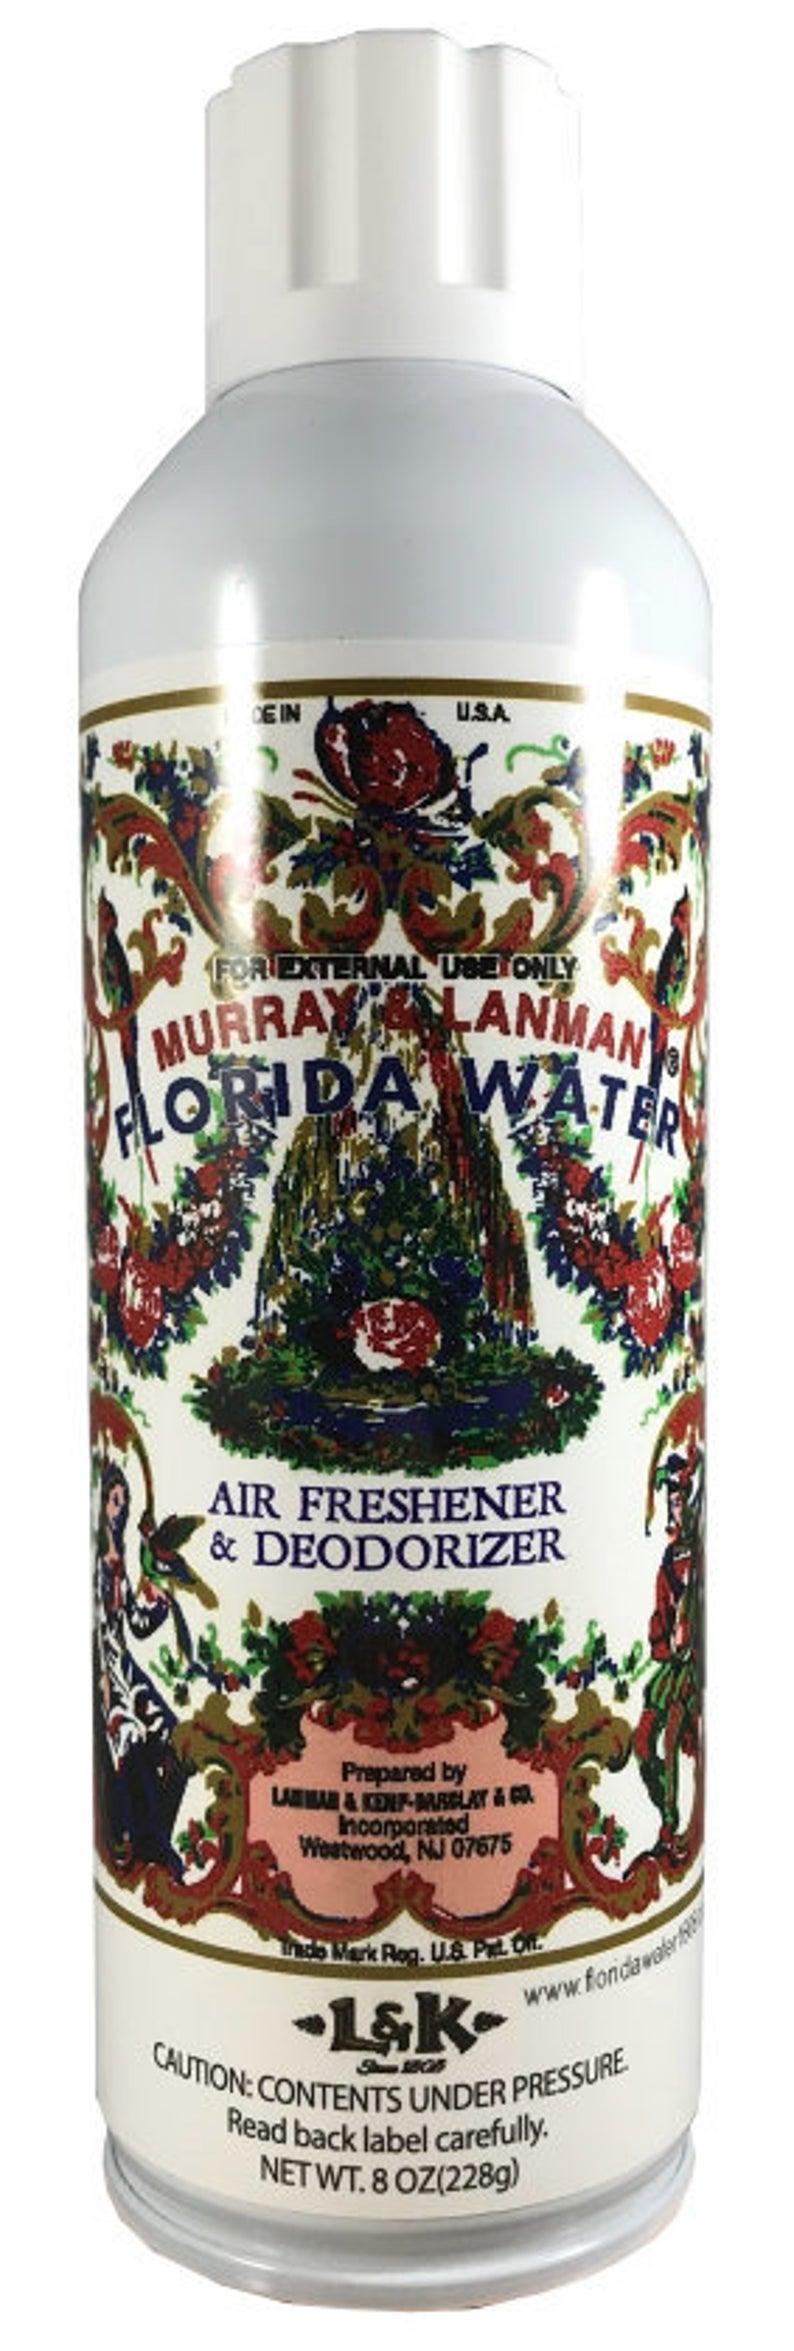 Murray & Lanman Florida Water Sprey - osviežovač vzduchu, 228 g